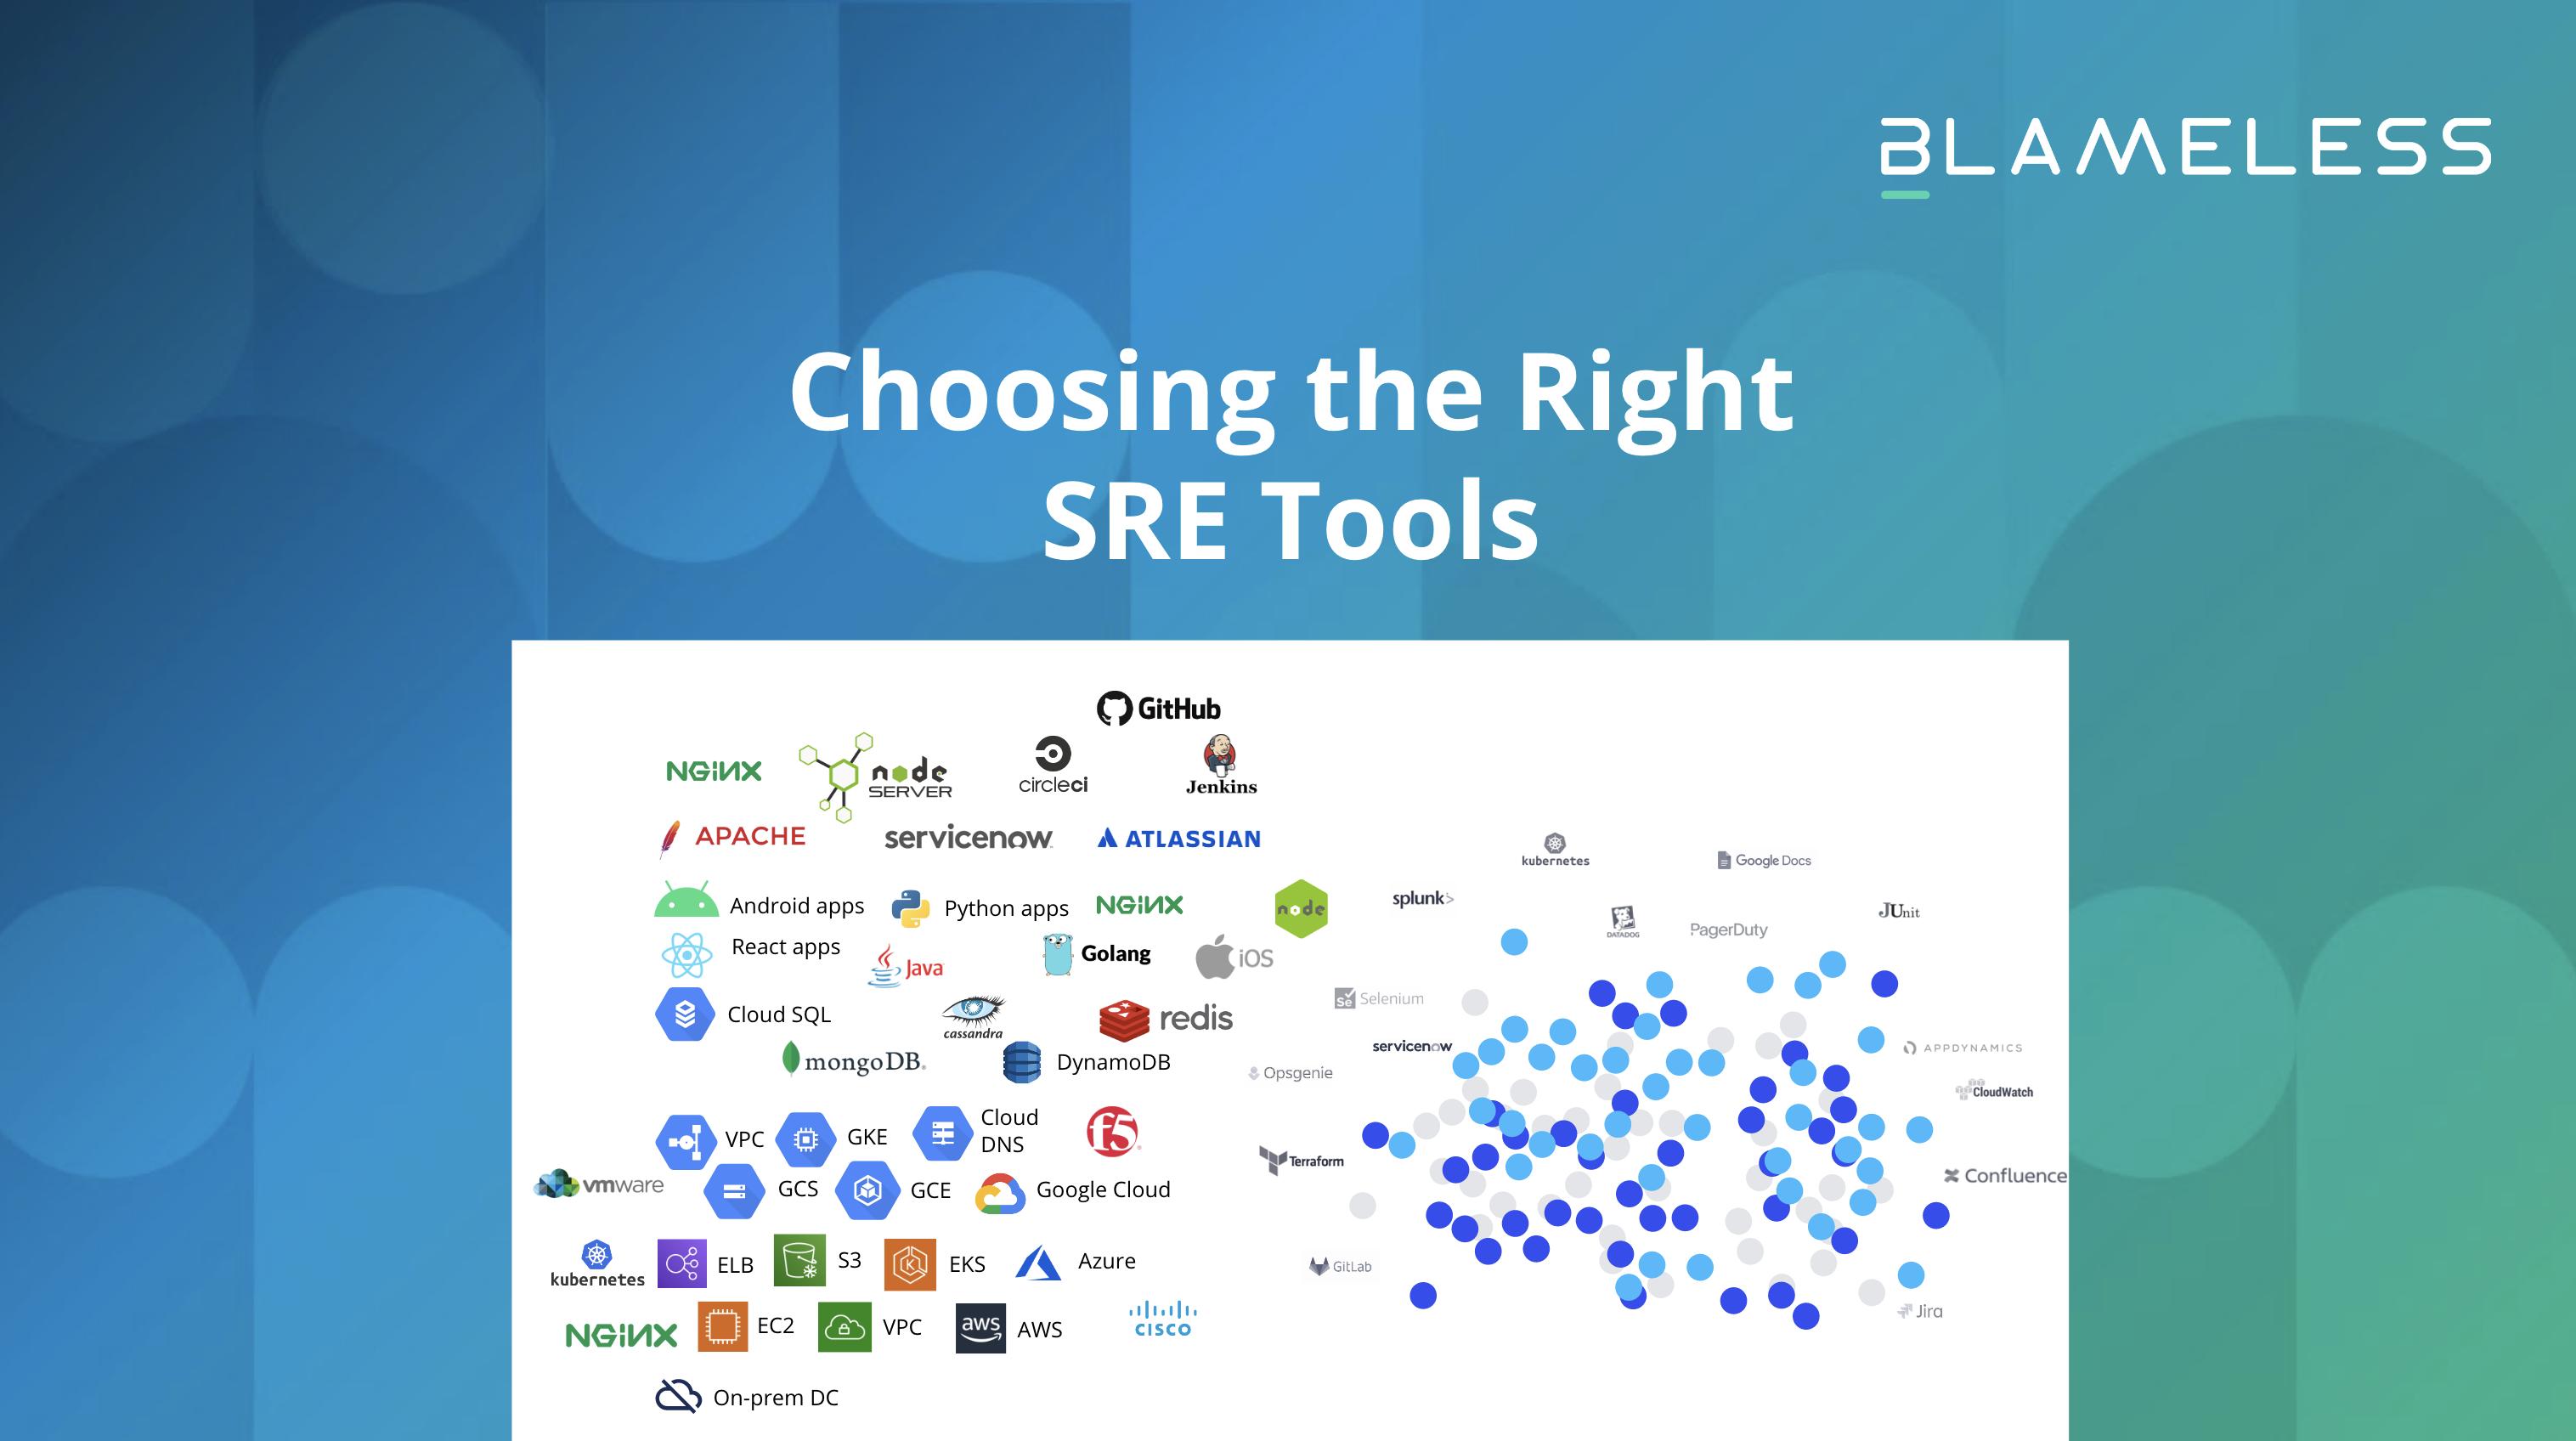 Choosing the Right SRE Tools